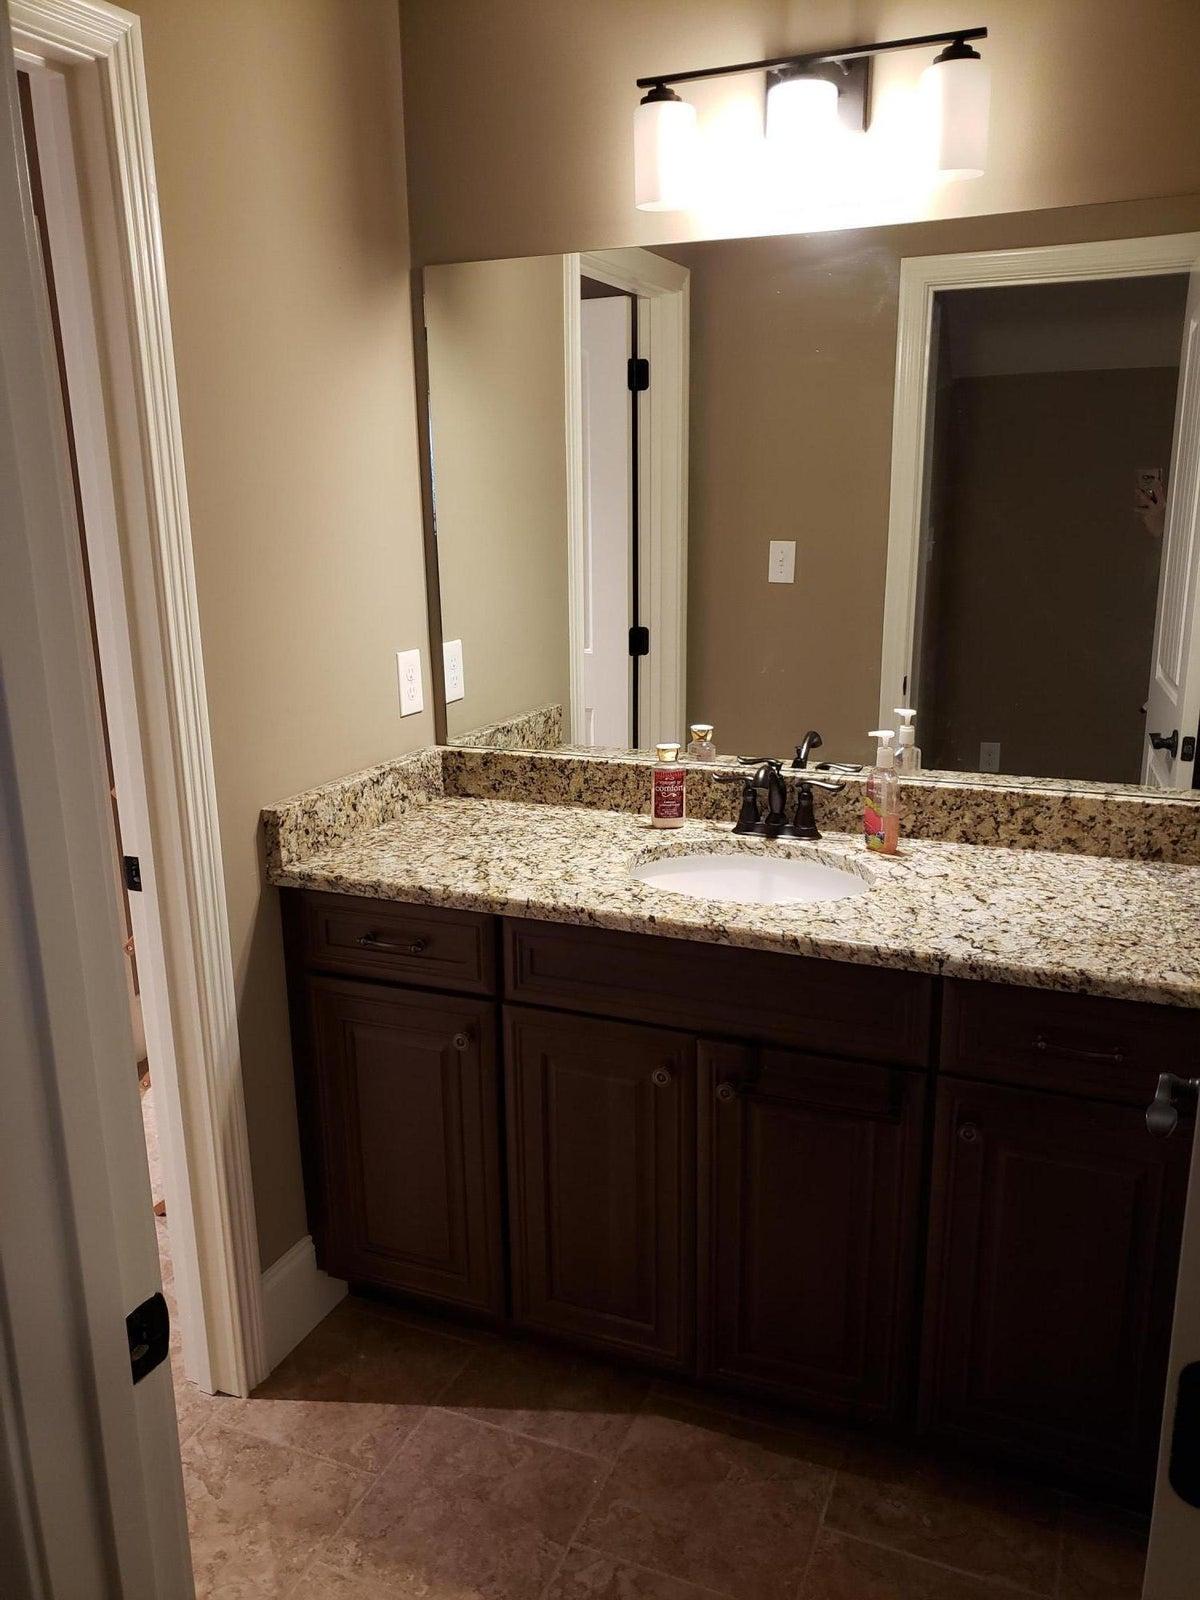 wendy siman - 17 jack and jill bathroom